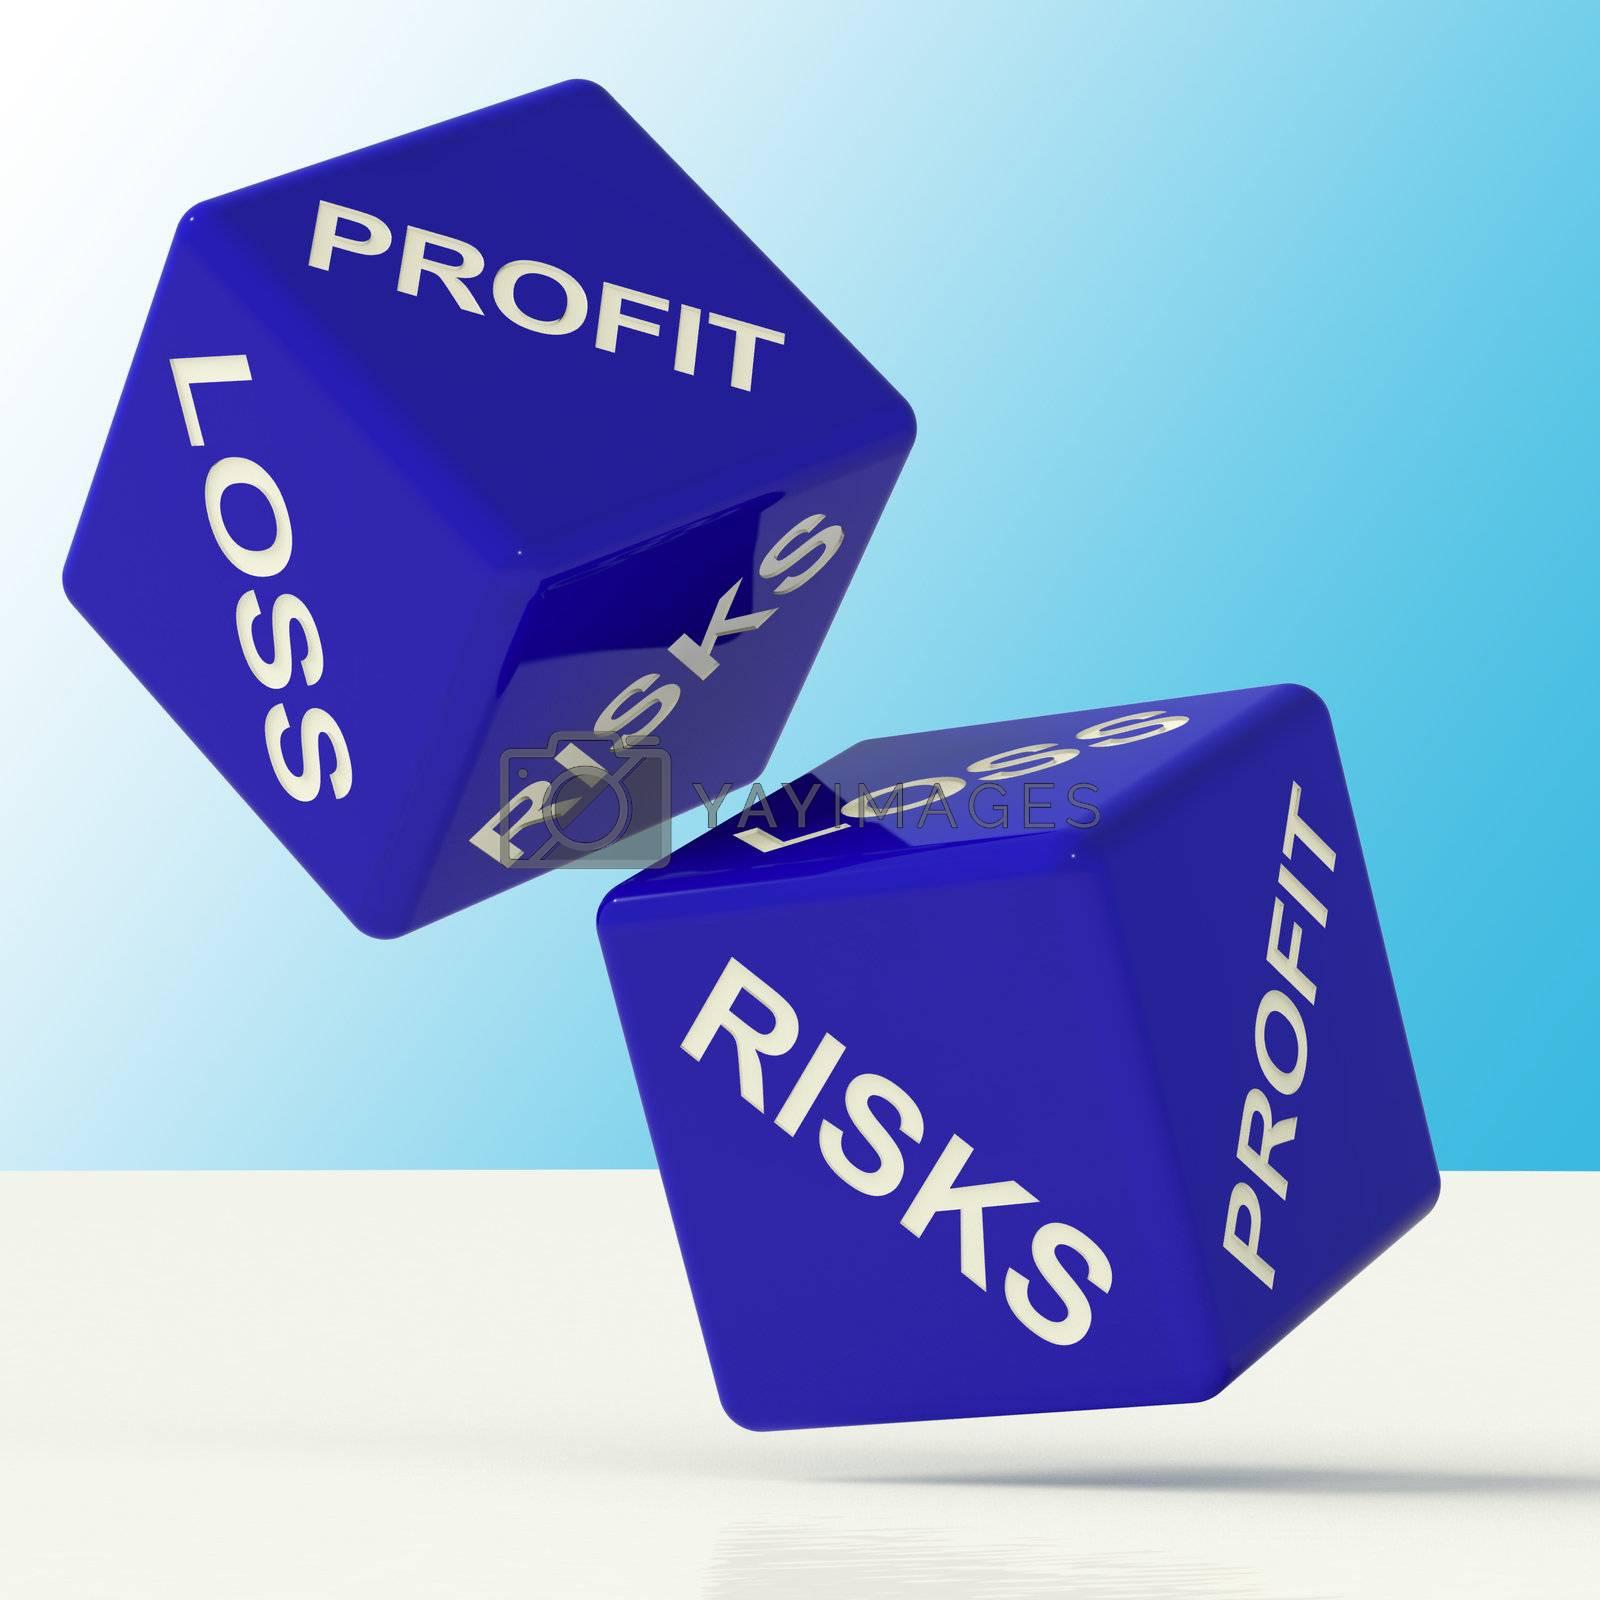 Profit Loss And Risks Blue Dice Showing Market Risk